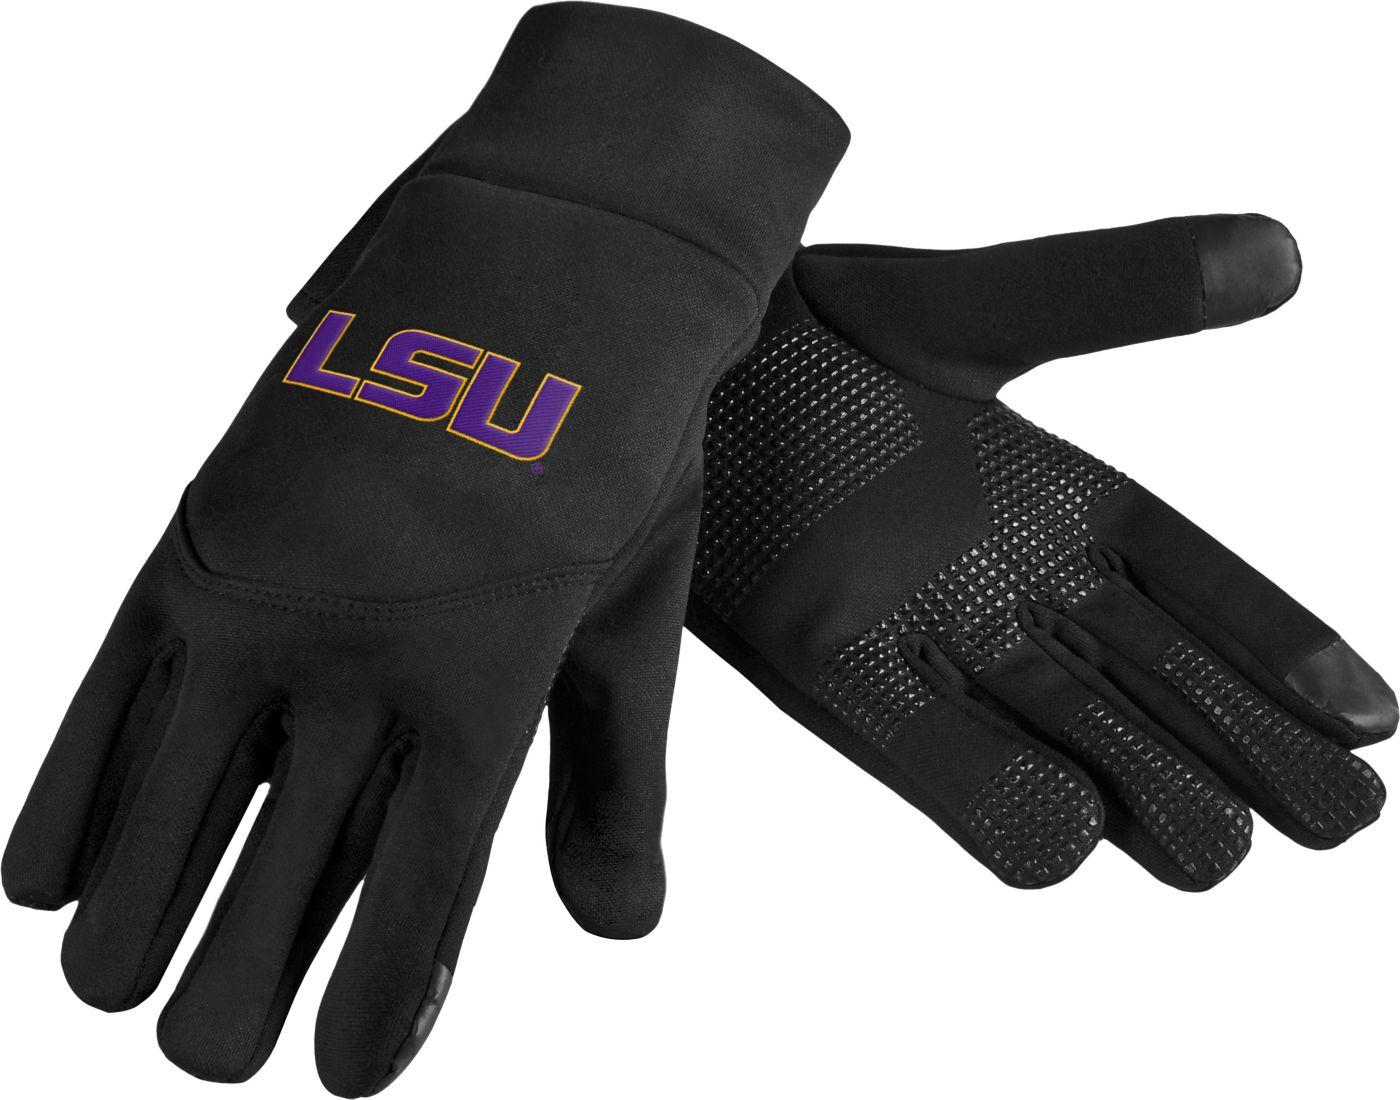 FOCO LSU Tigers Texting Gloves